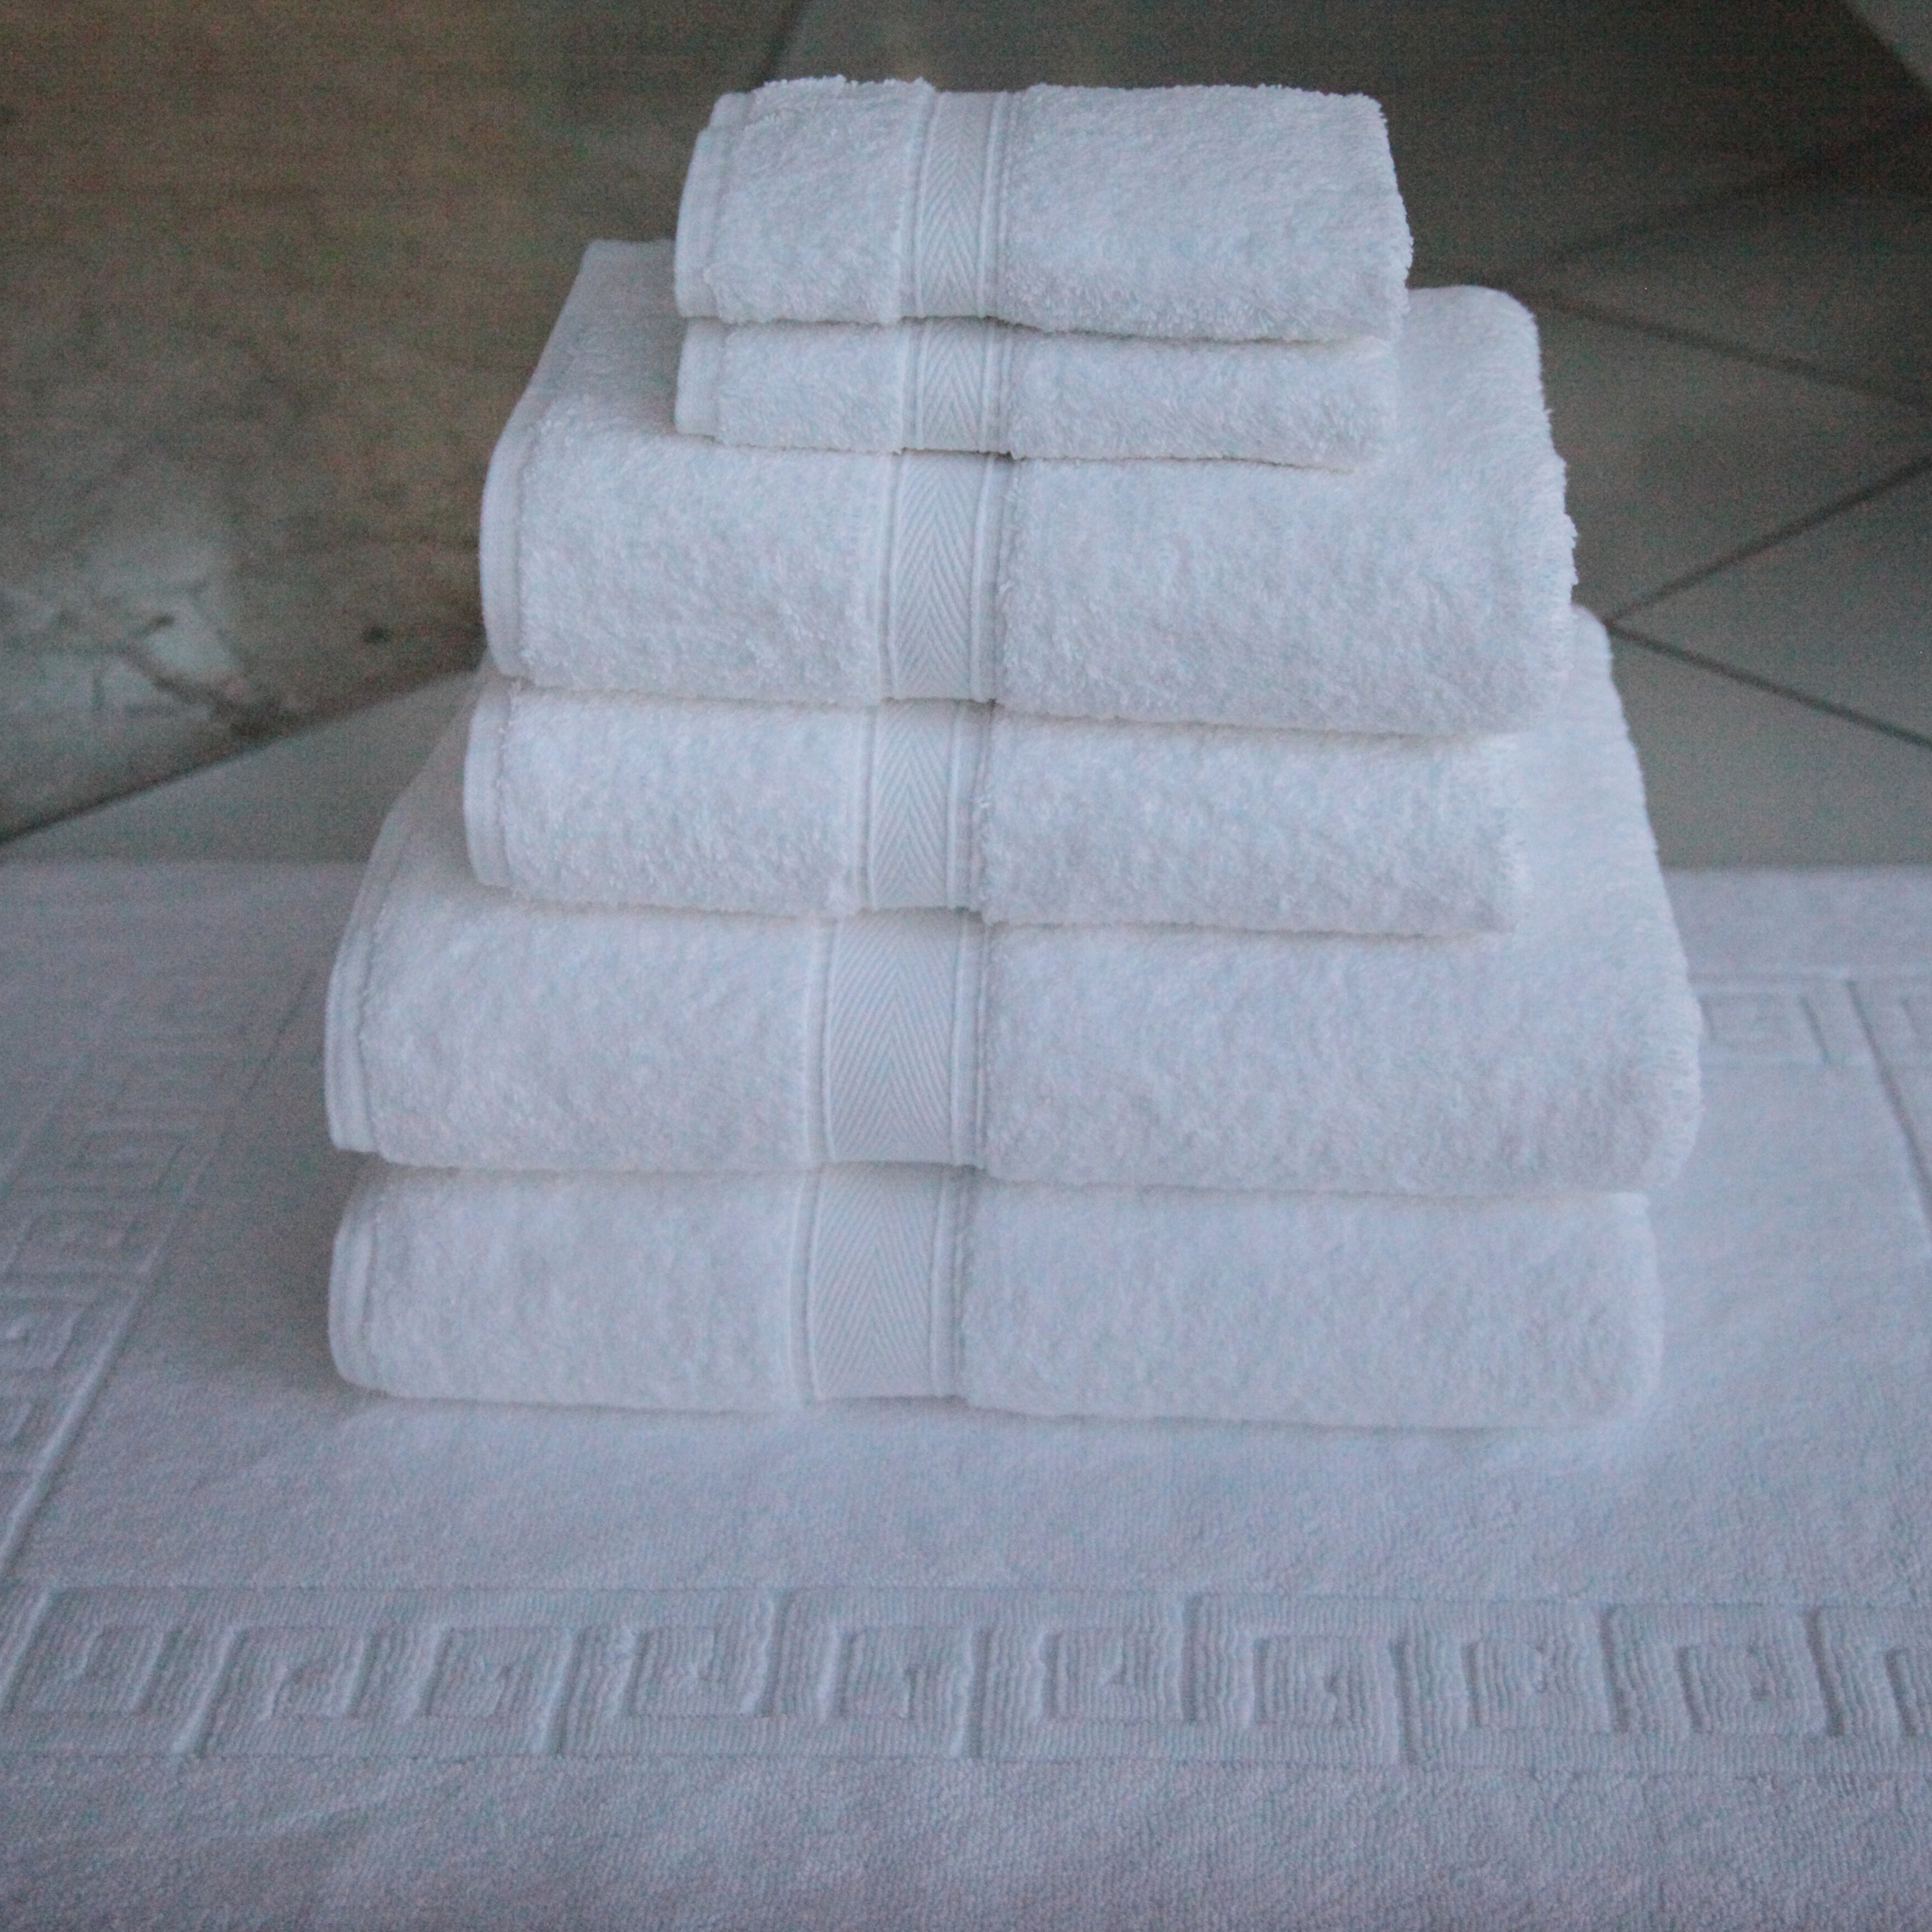 Darby Home Co Spady 7 Piece Turkish Cotton Towel Set Reviews Wayfair